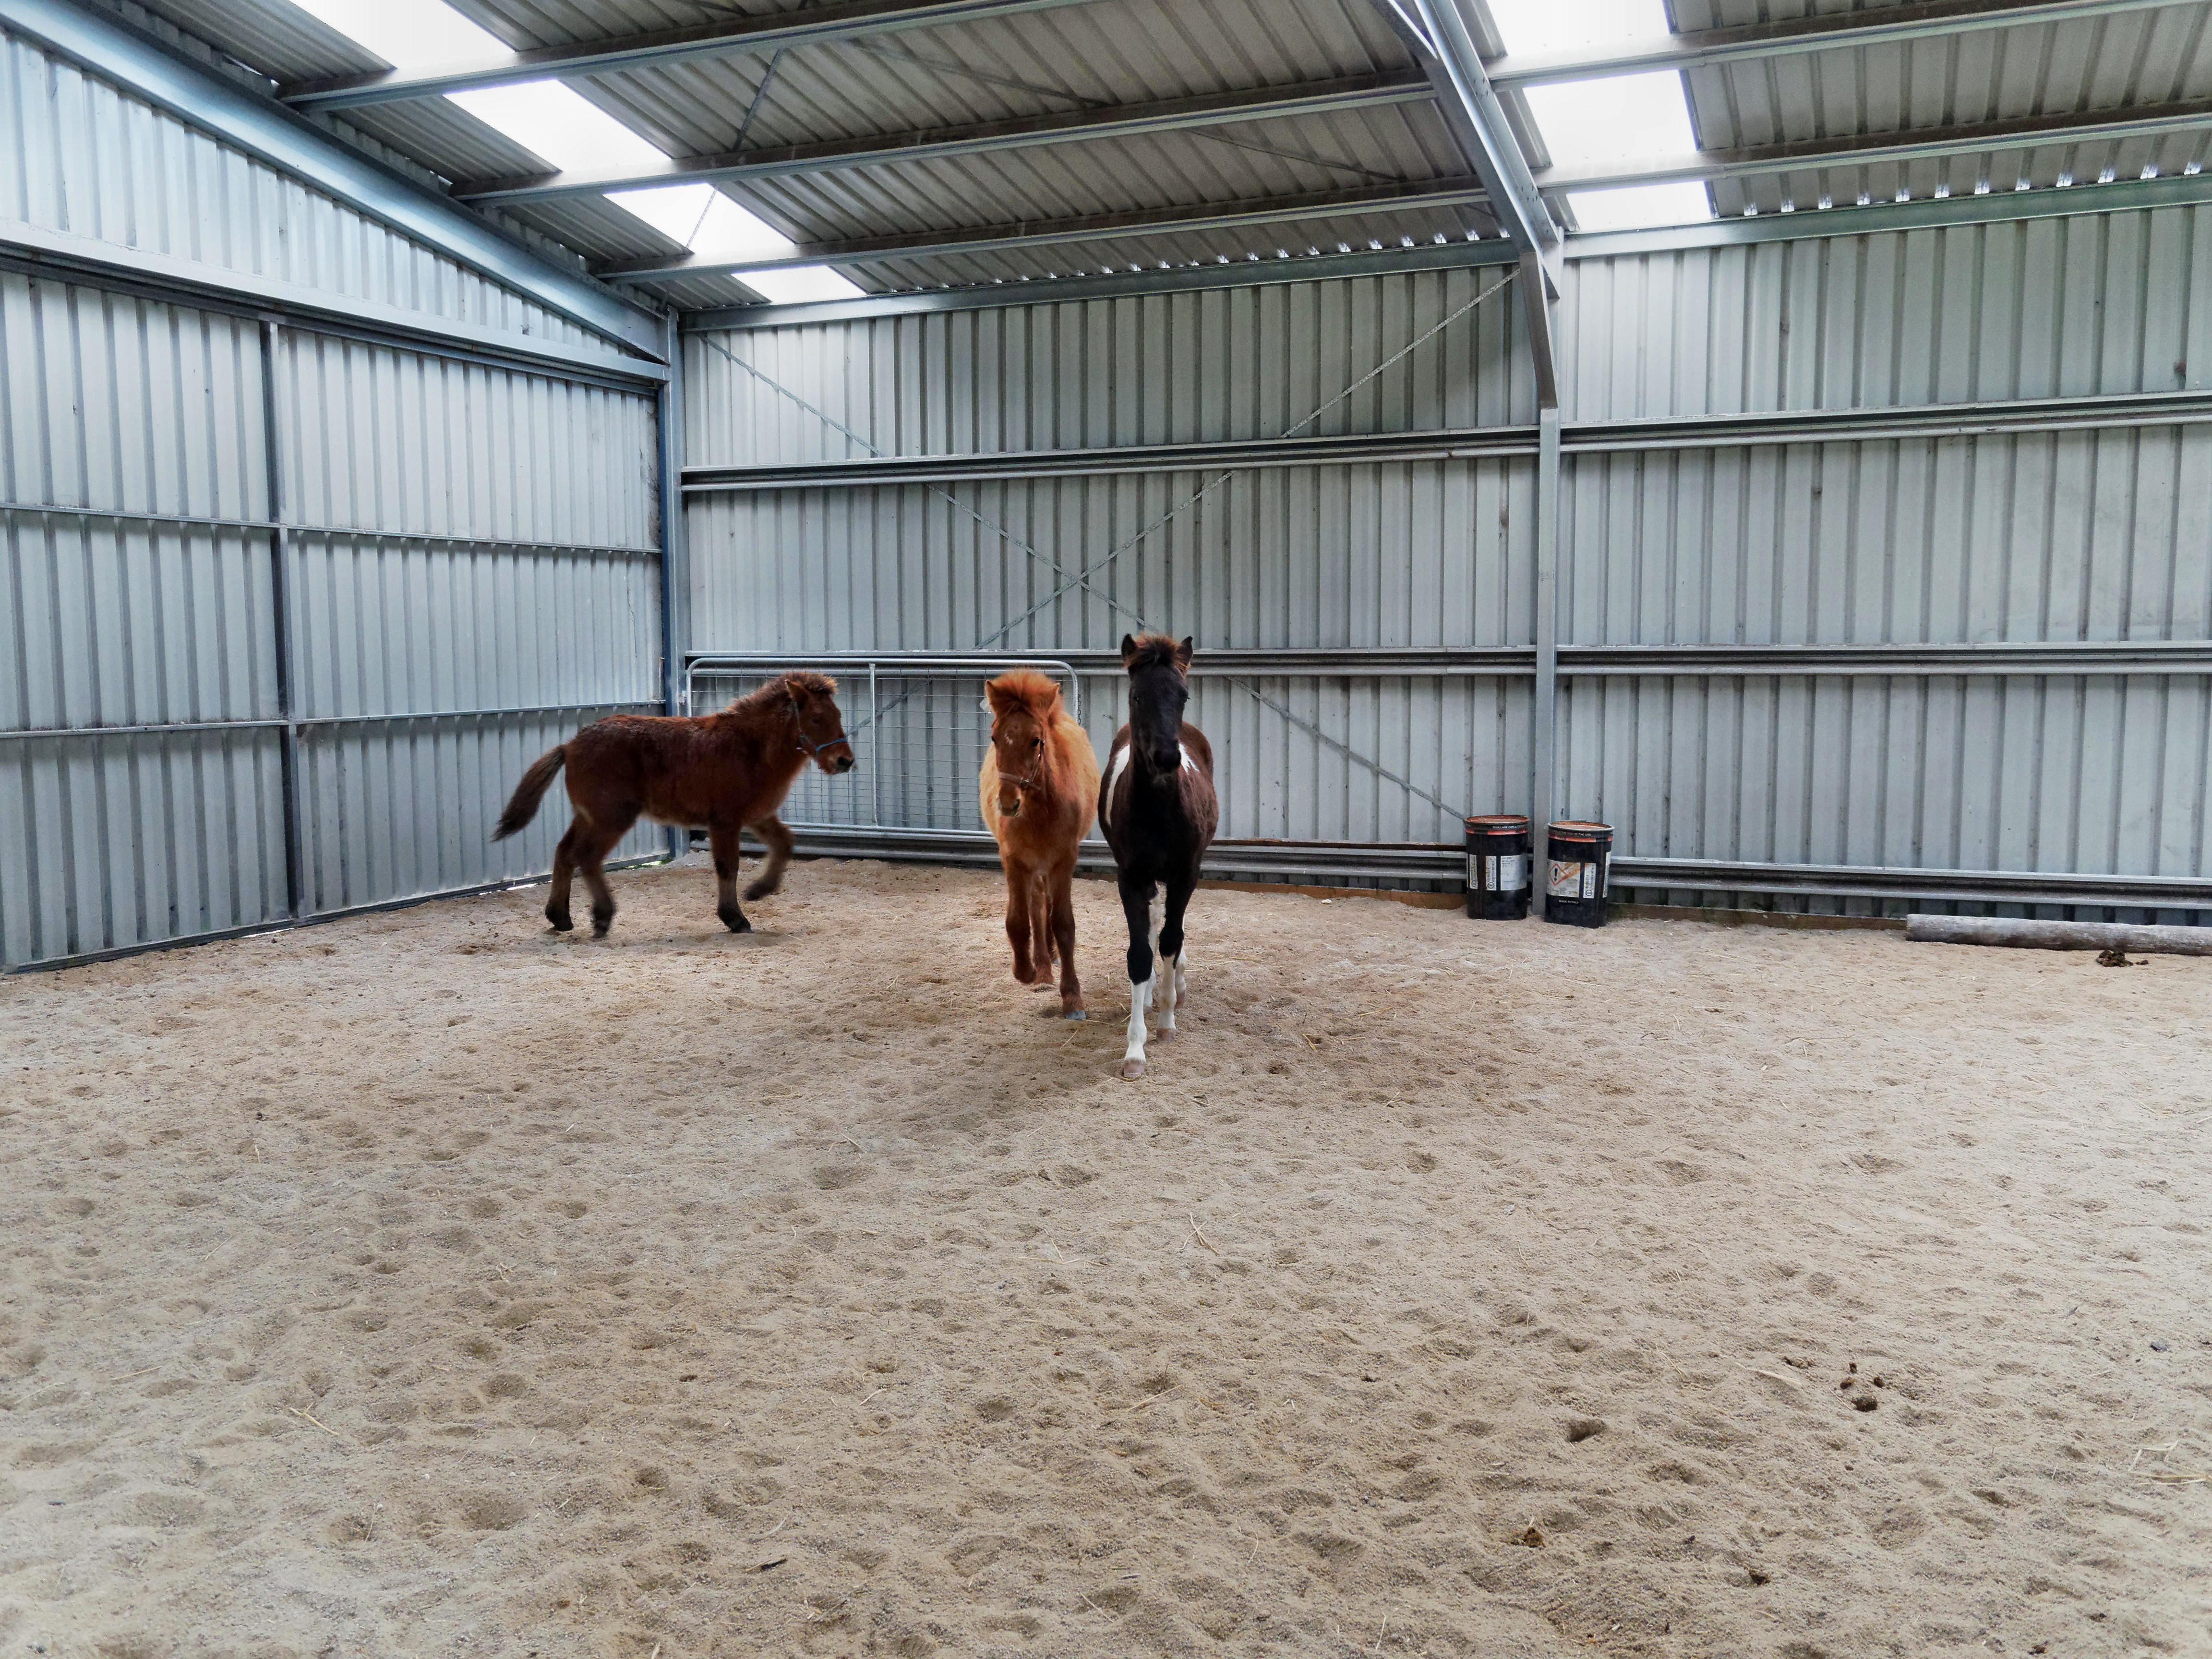 Horses-27.jpeg